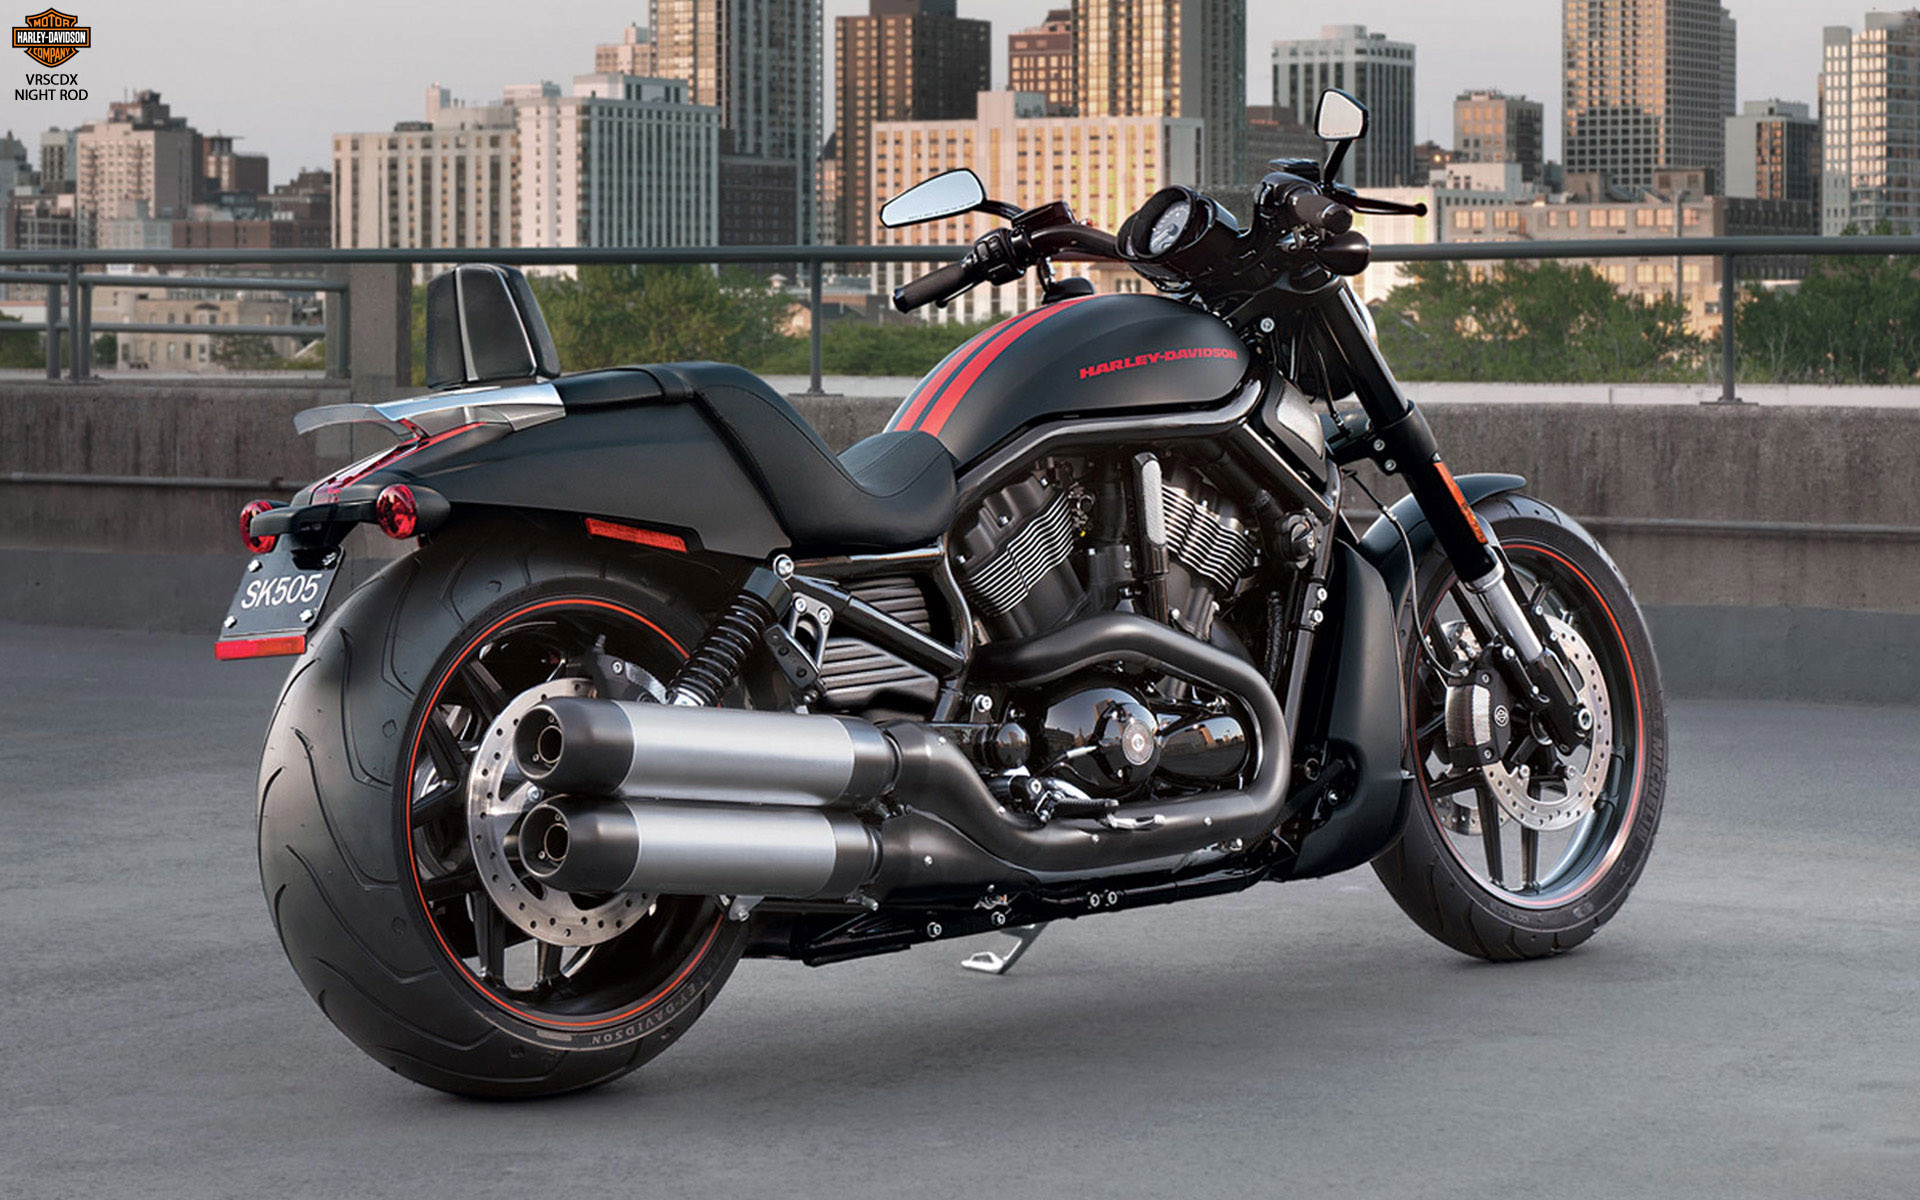 Harley Davidson Wallpapers And Screensavers: Harley Davidson Wallpapers And Screensavers (80+ Images